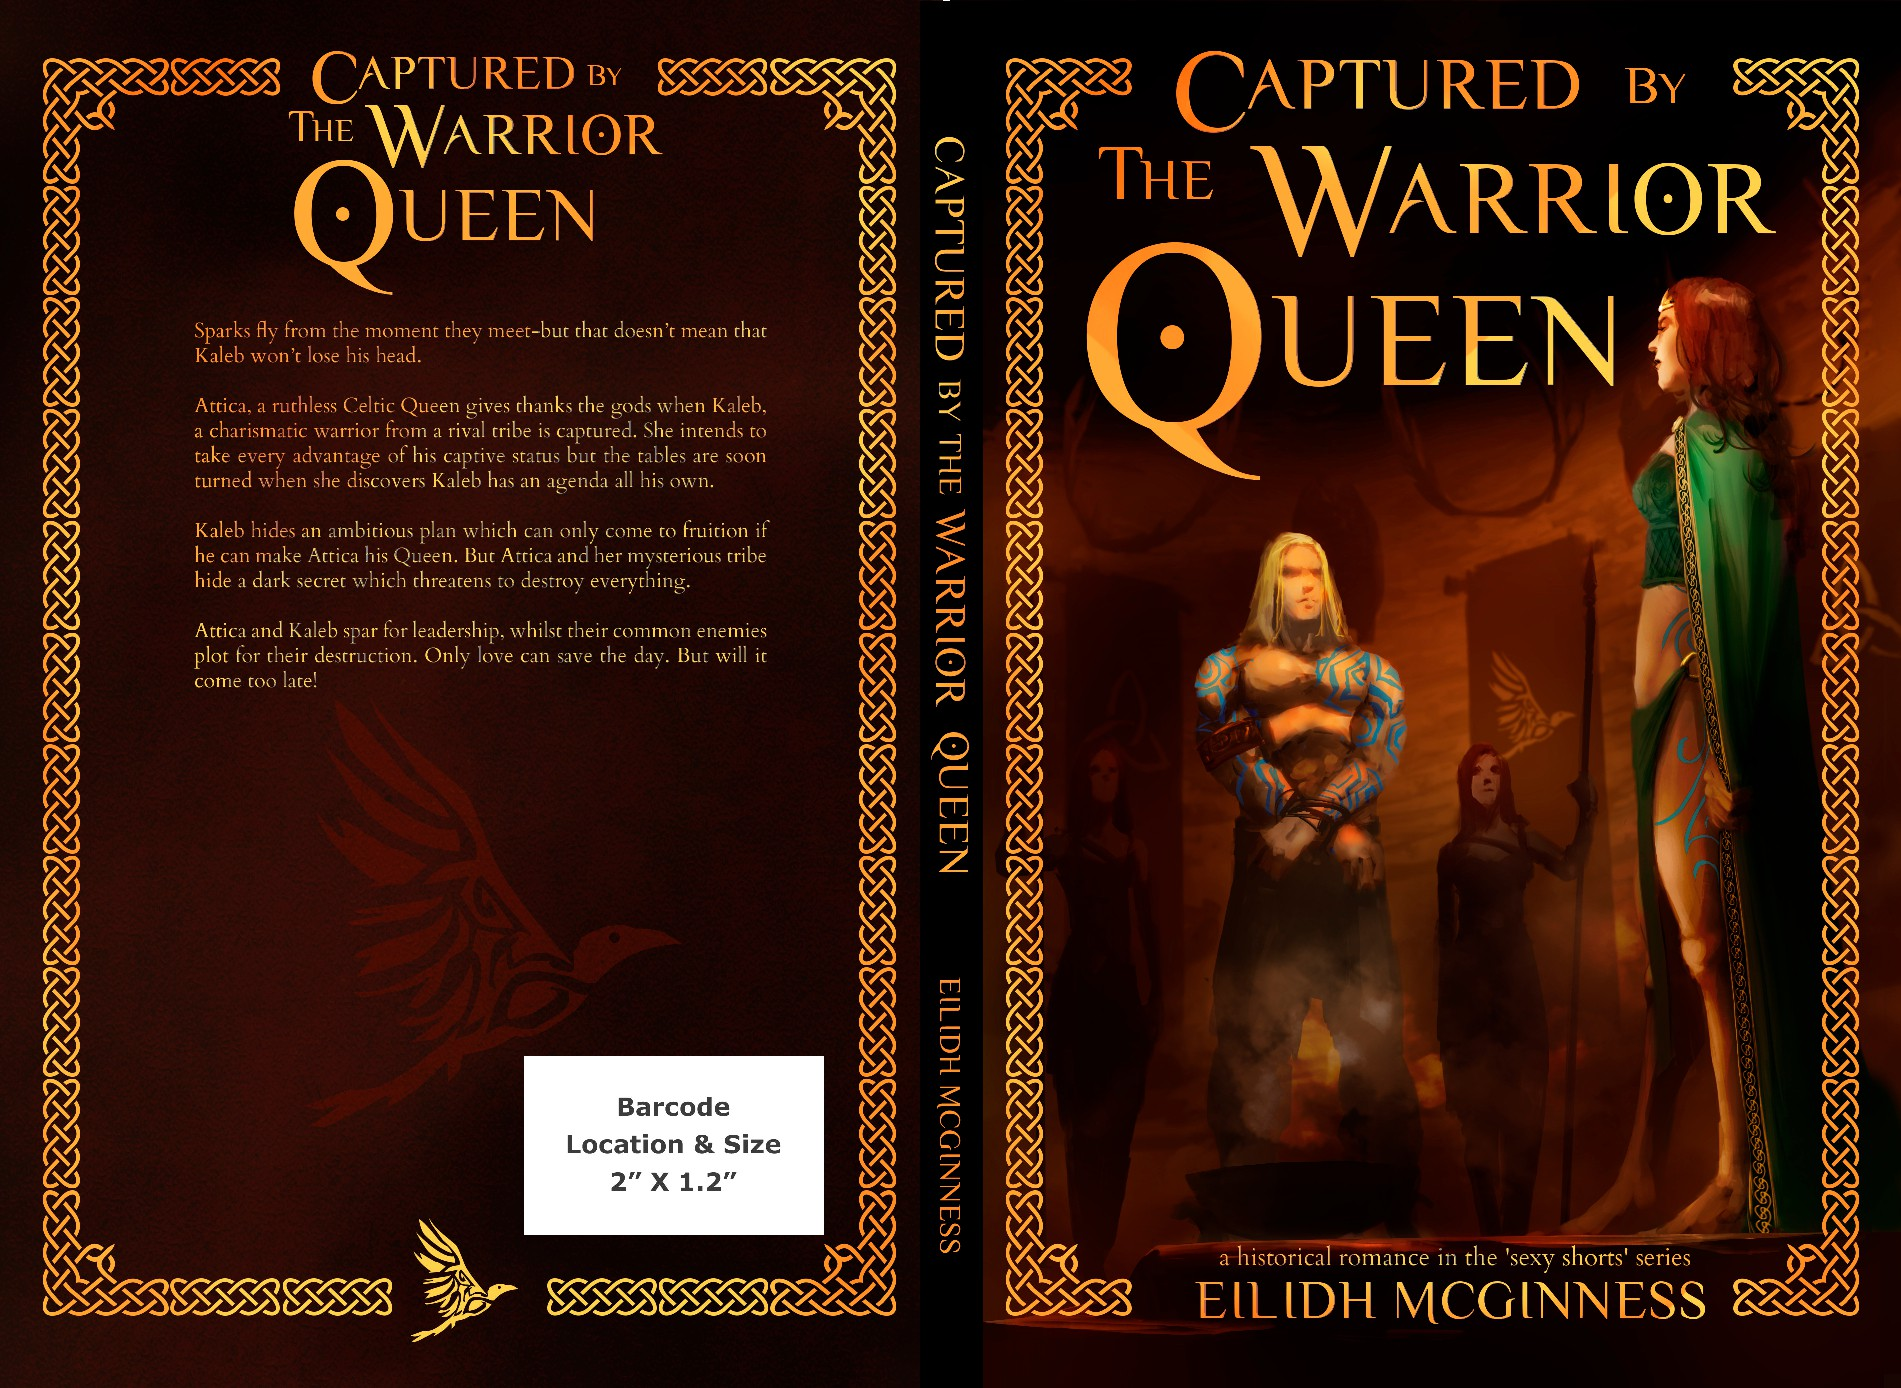 Captured by the Warrior Queen